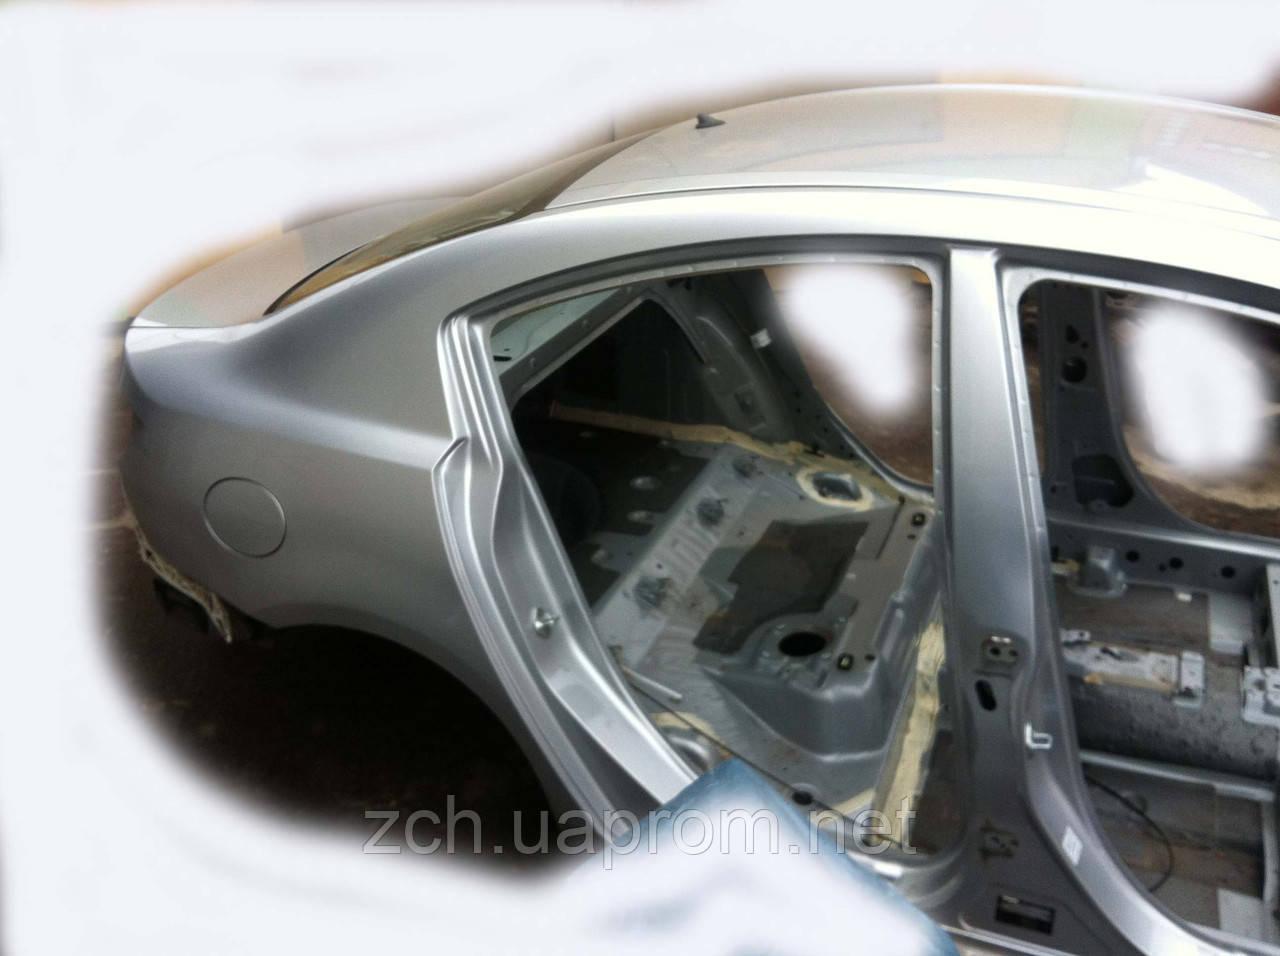 Стойка кузова средняя Mazda 3 sedan